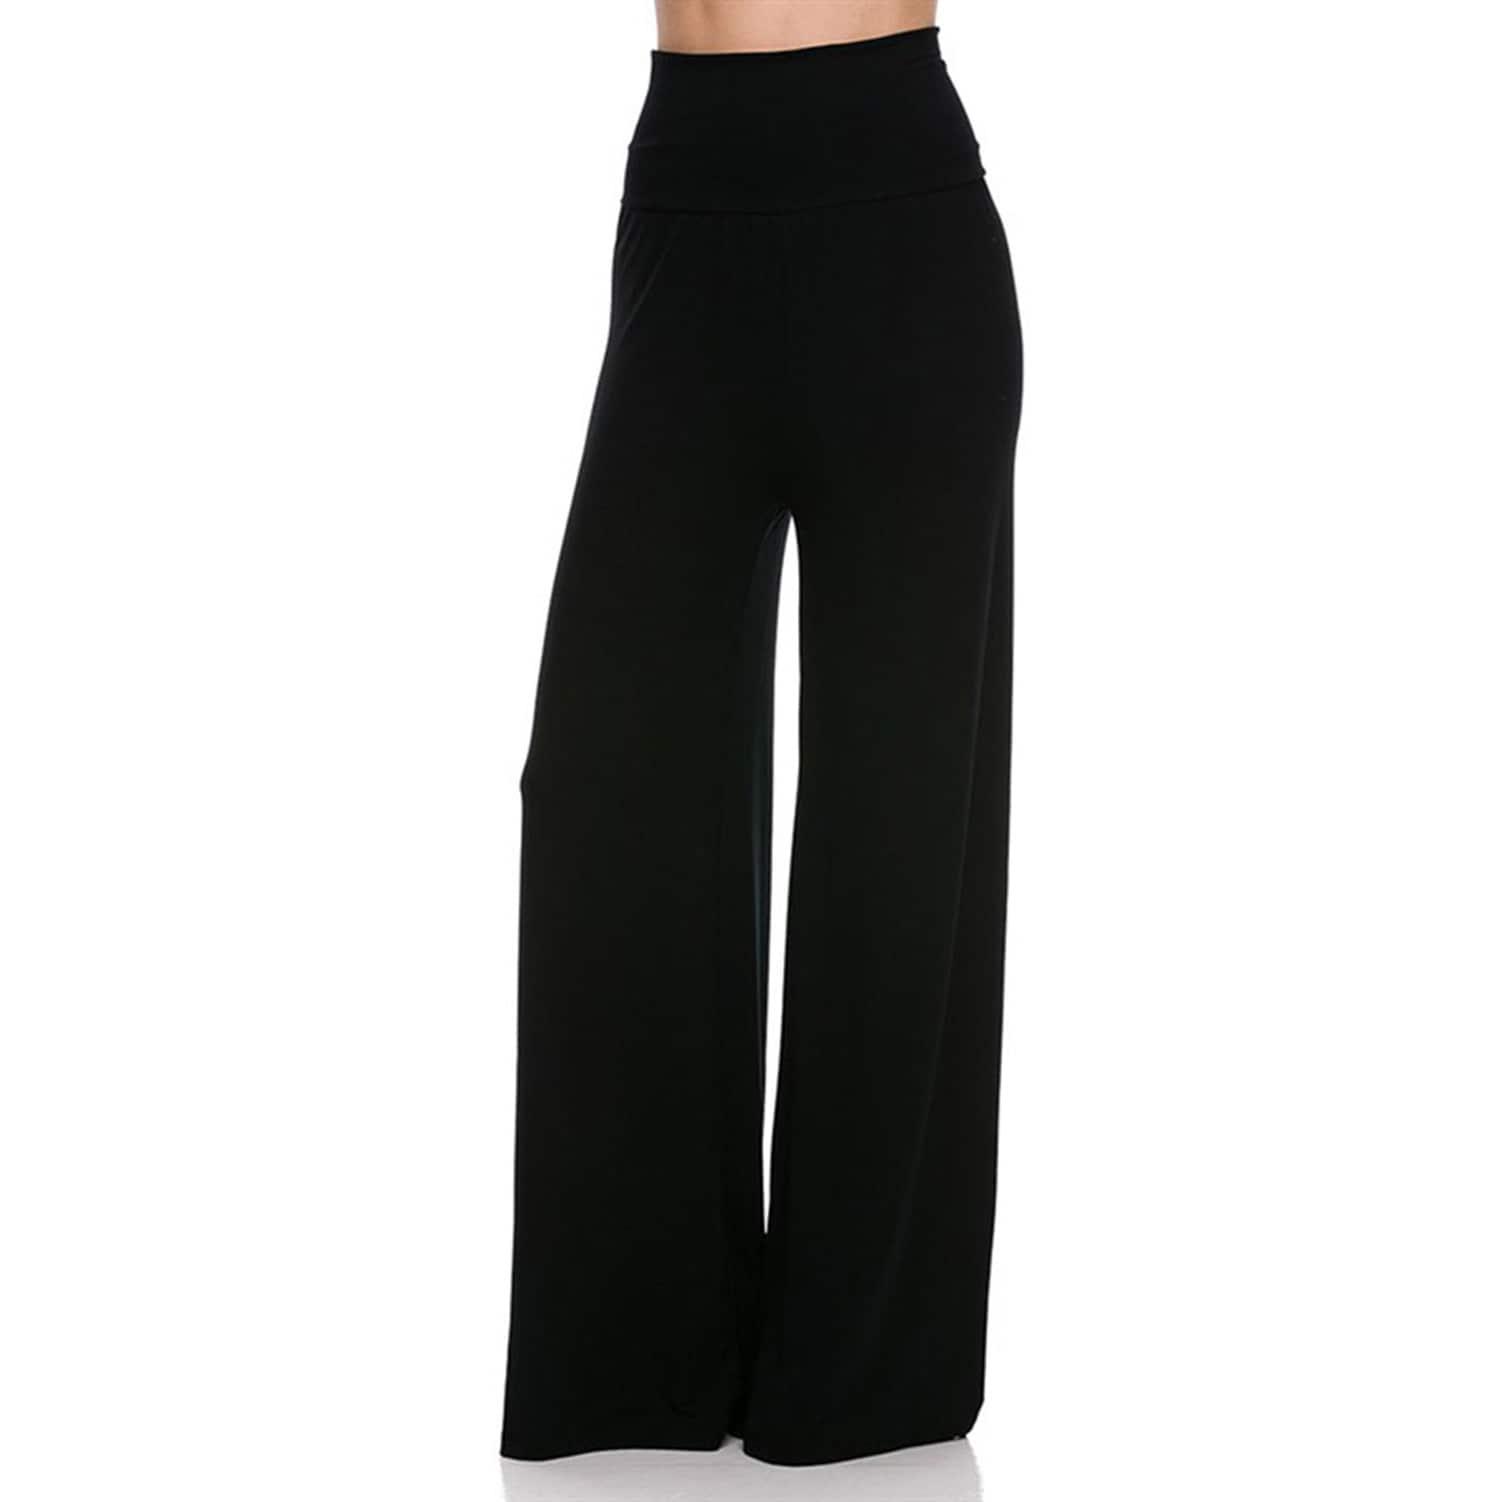 e3f6f31e156 Shop JED Women s Wide Leg Palazzo Pants - On Sale - Free Shipping On ...